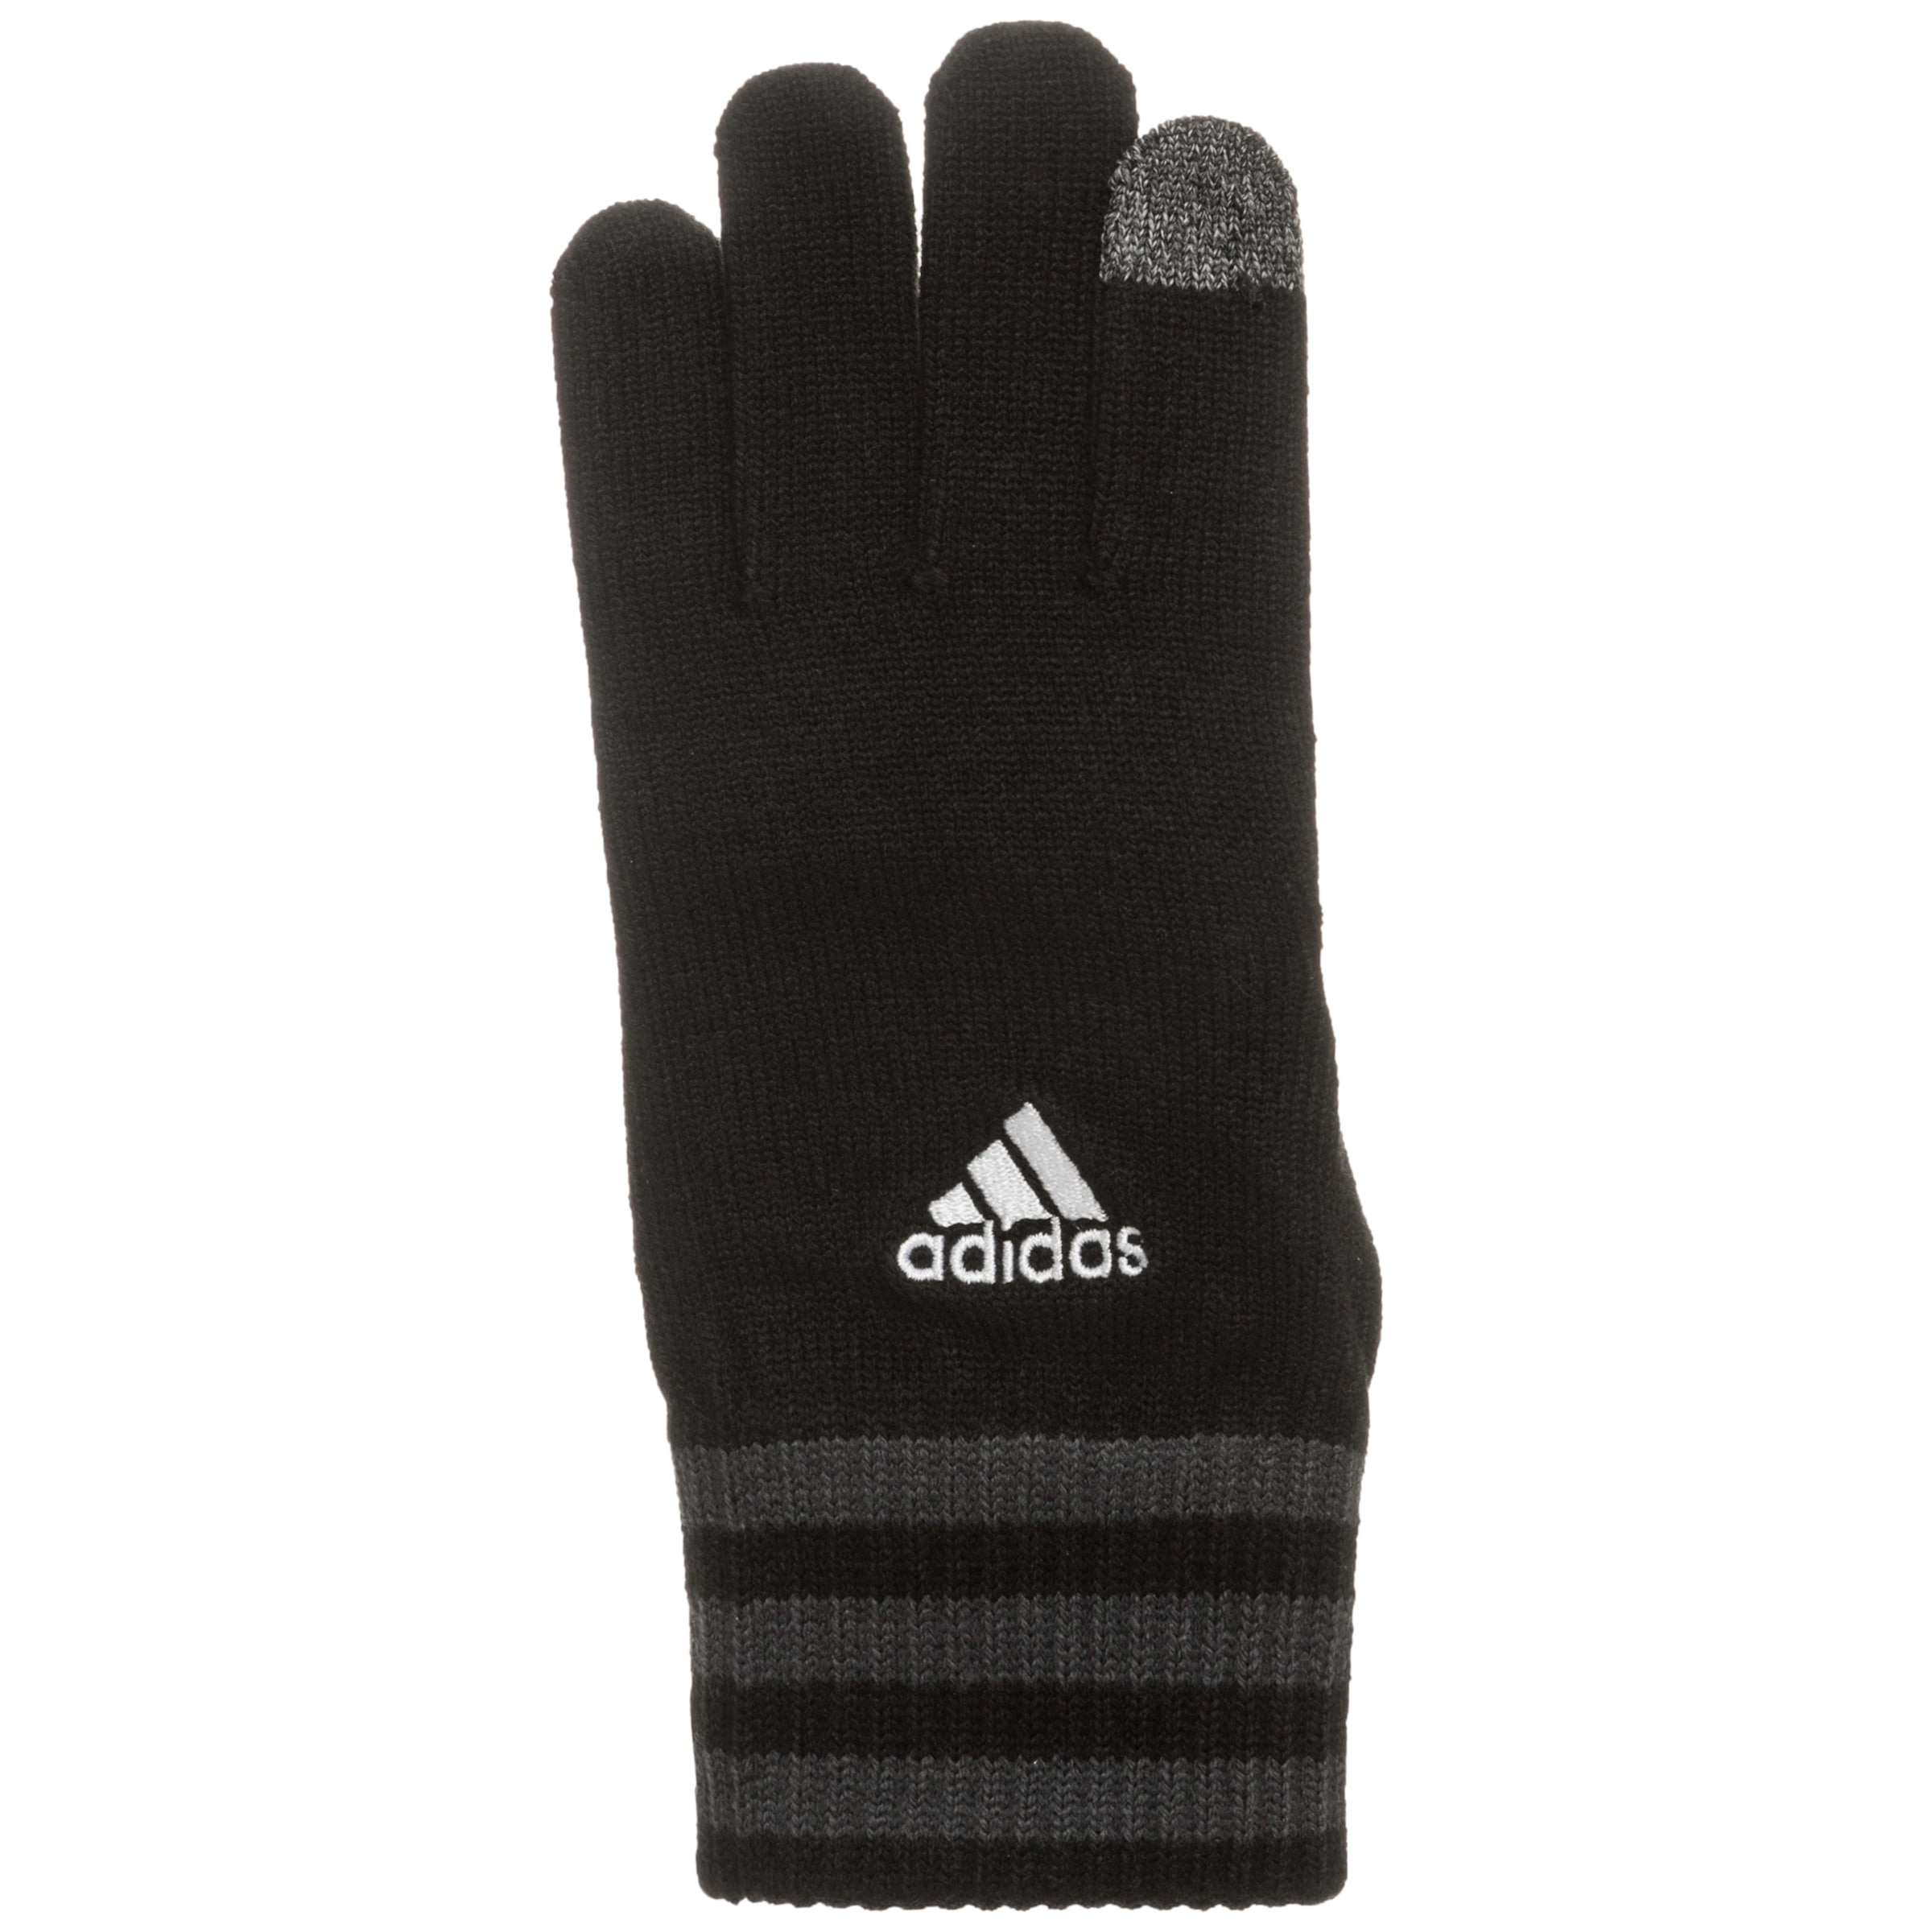 Schwarz In 'tiro' Feldspielerhandschuhe Adidas Performance kuPXZi